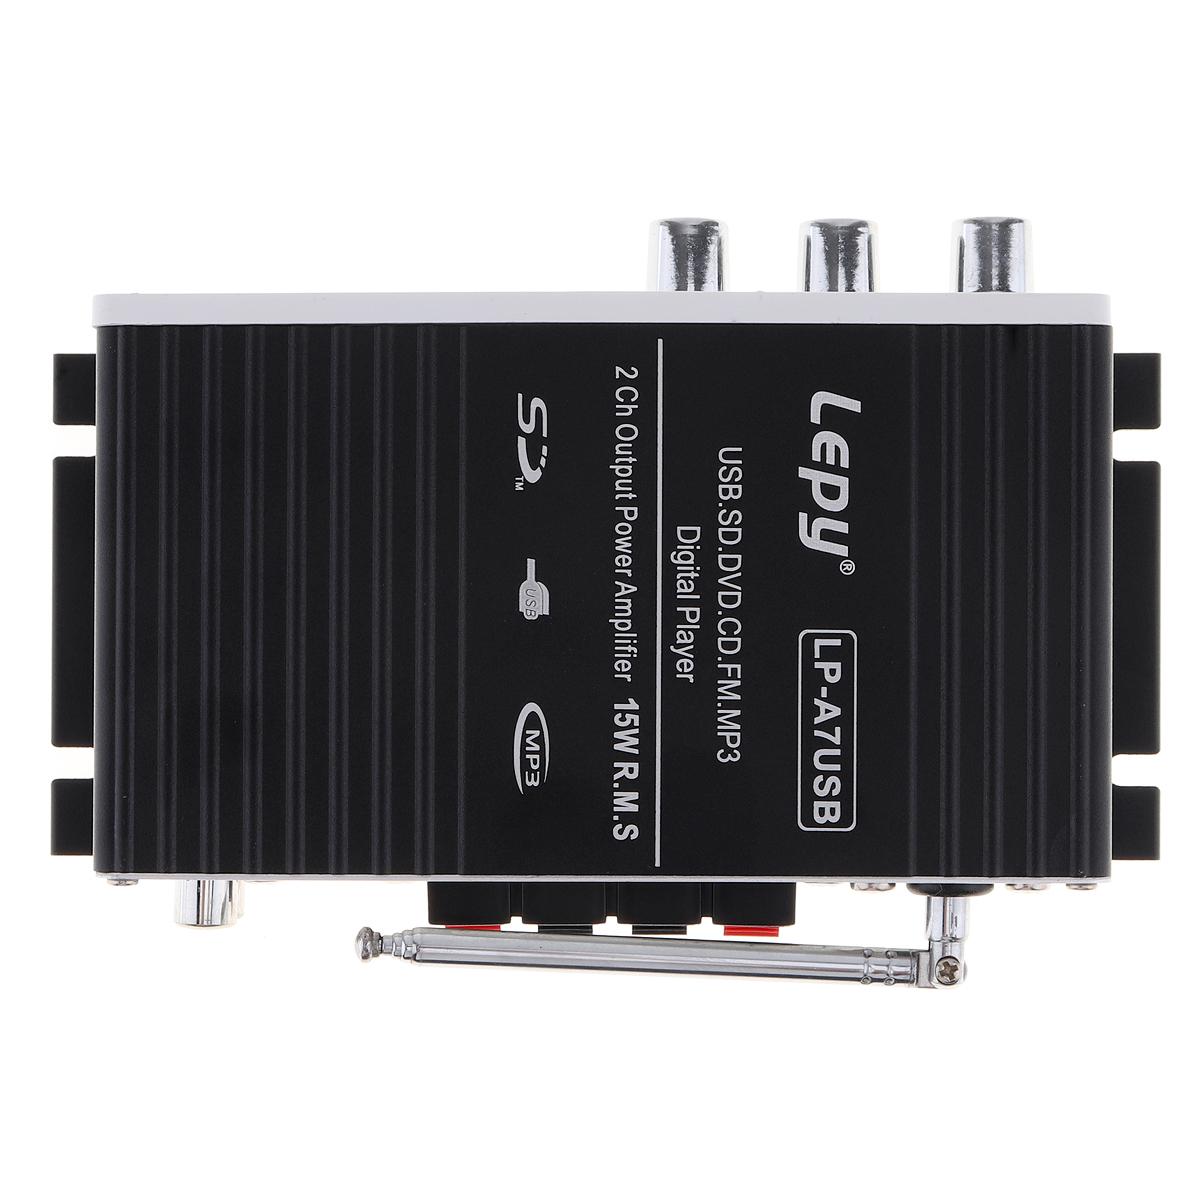 LEPY-Bluetooth-Mini-Power-Audio-Amplifier-Hi-Fi-AMP-MP3-FM-USB-SD-AUX-Car-Home thumbnail 11